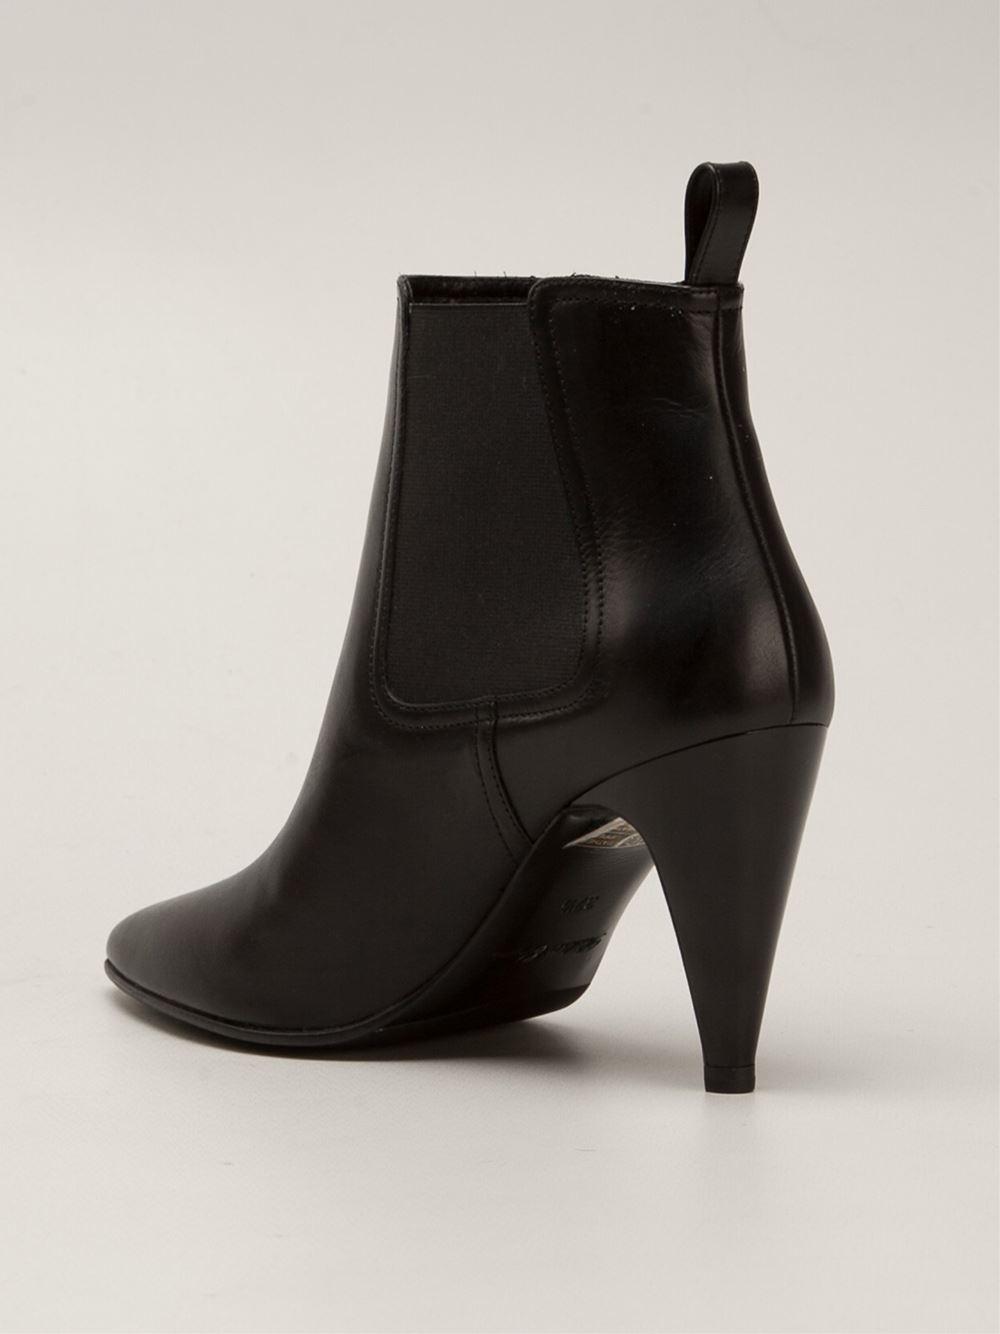 Robert Clergerie Kute Boots in Black